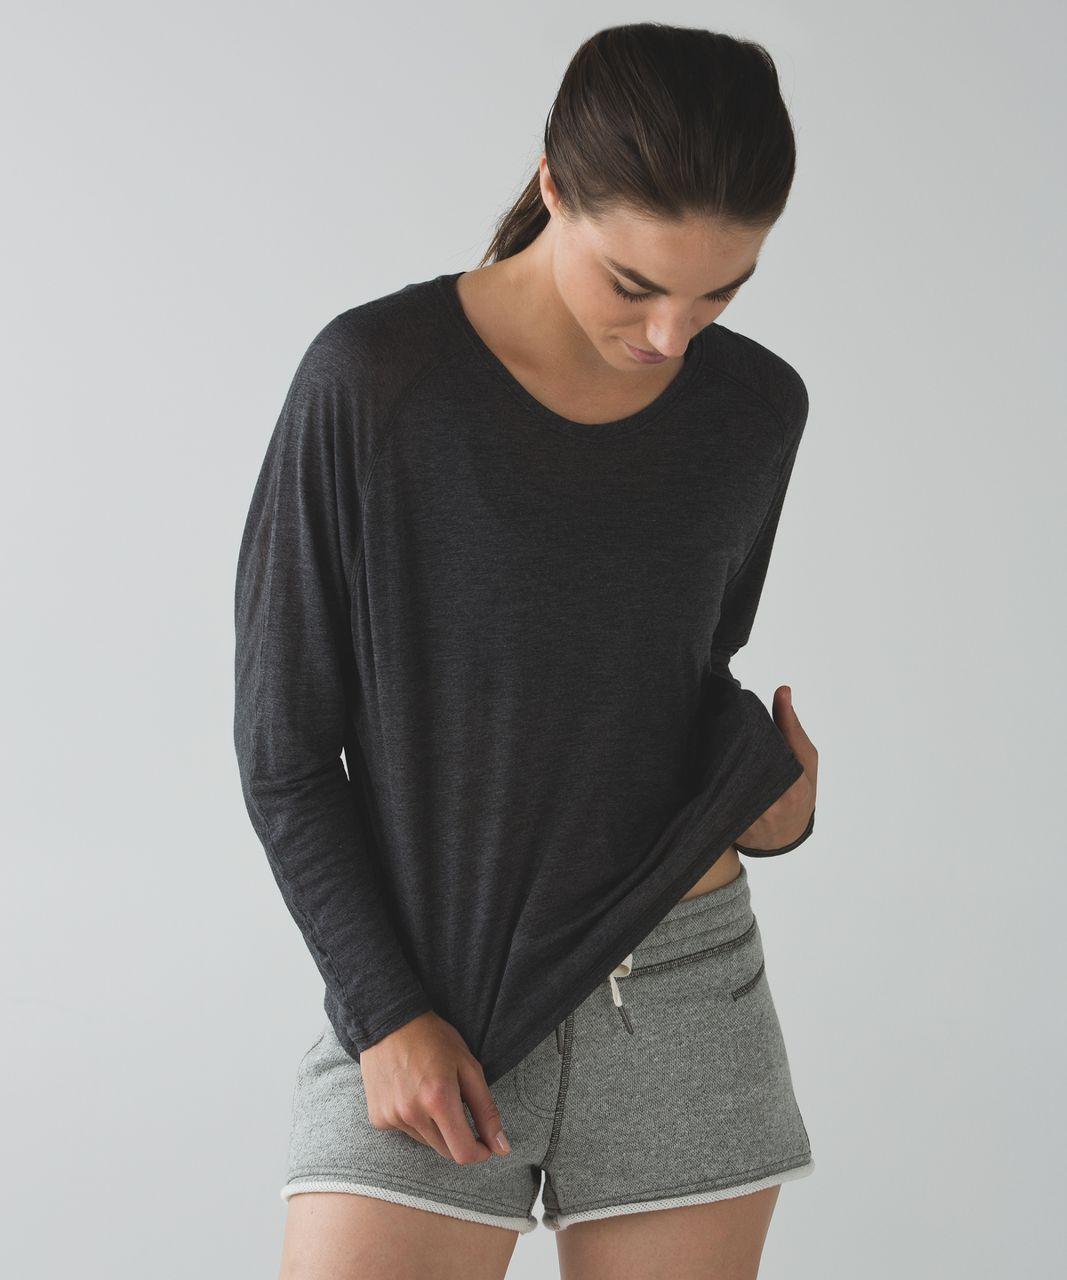 Lululemon Made To Layer Long Sleeve Tee - Heathered Mod Black